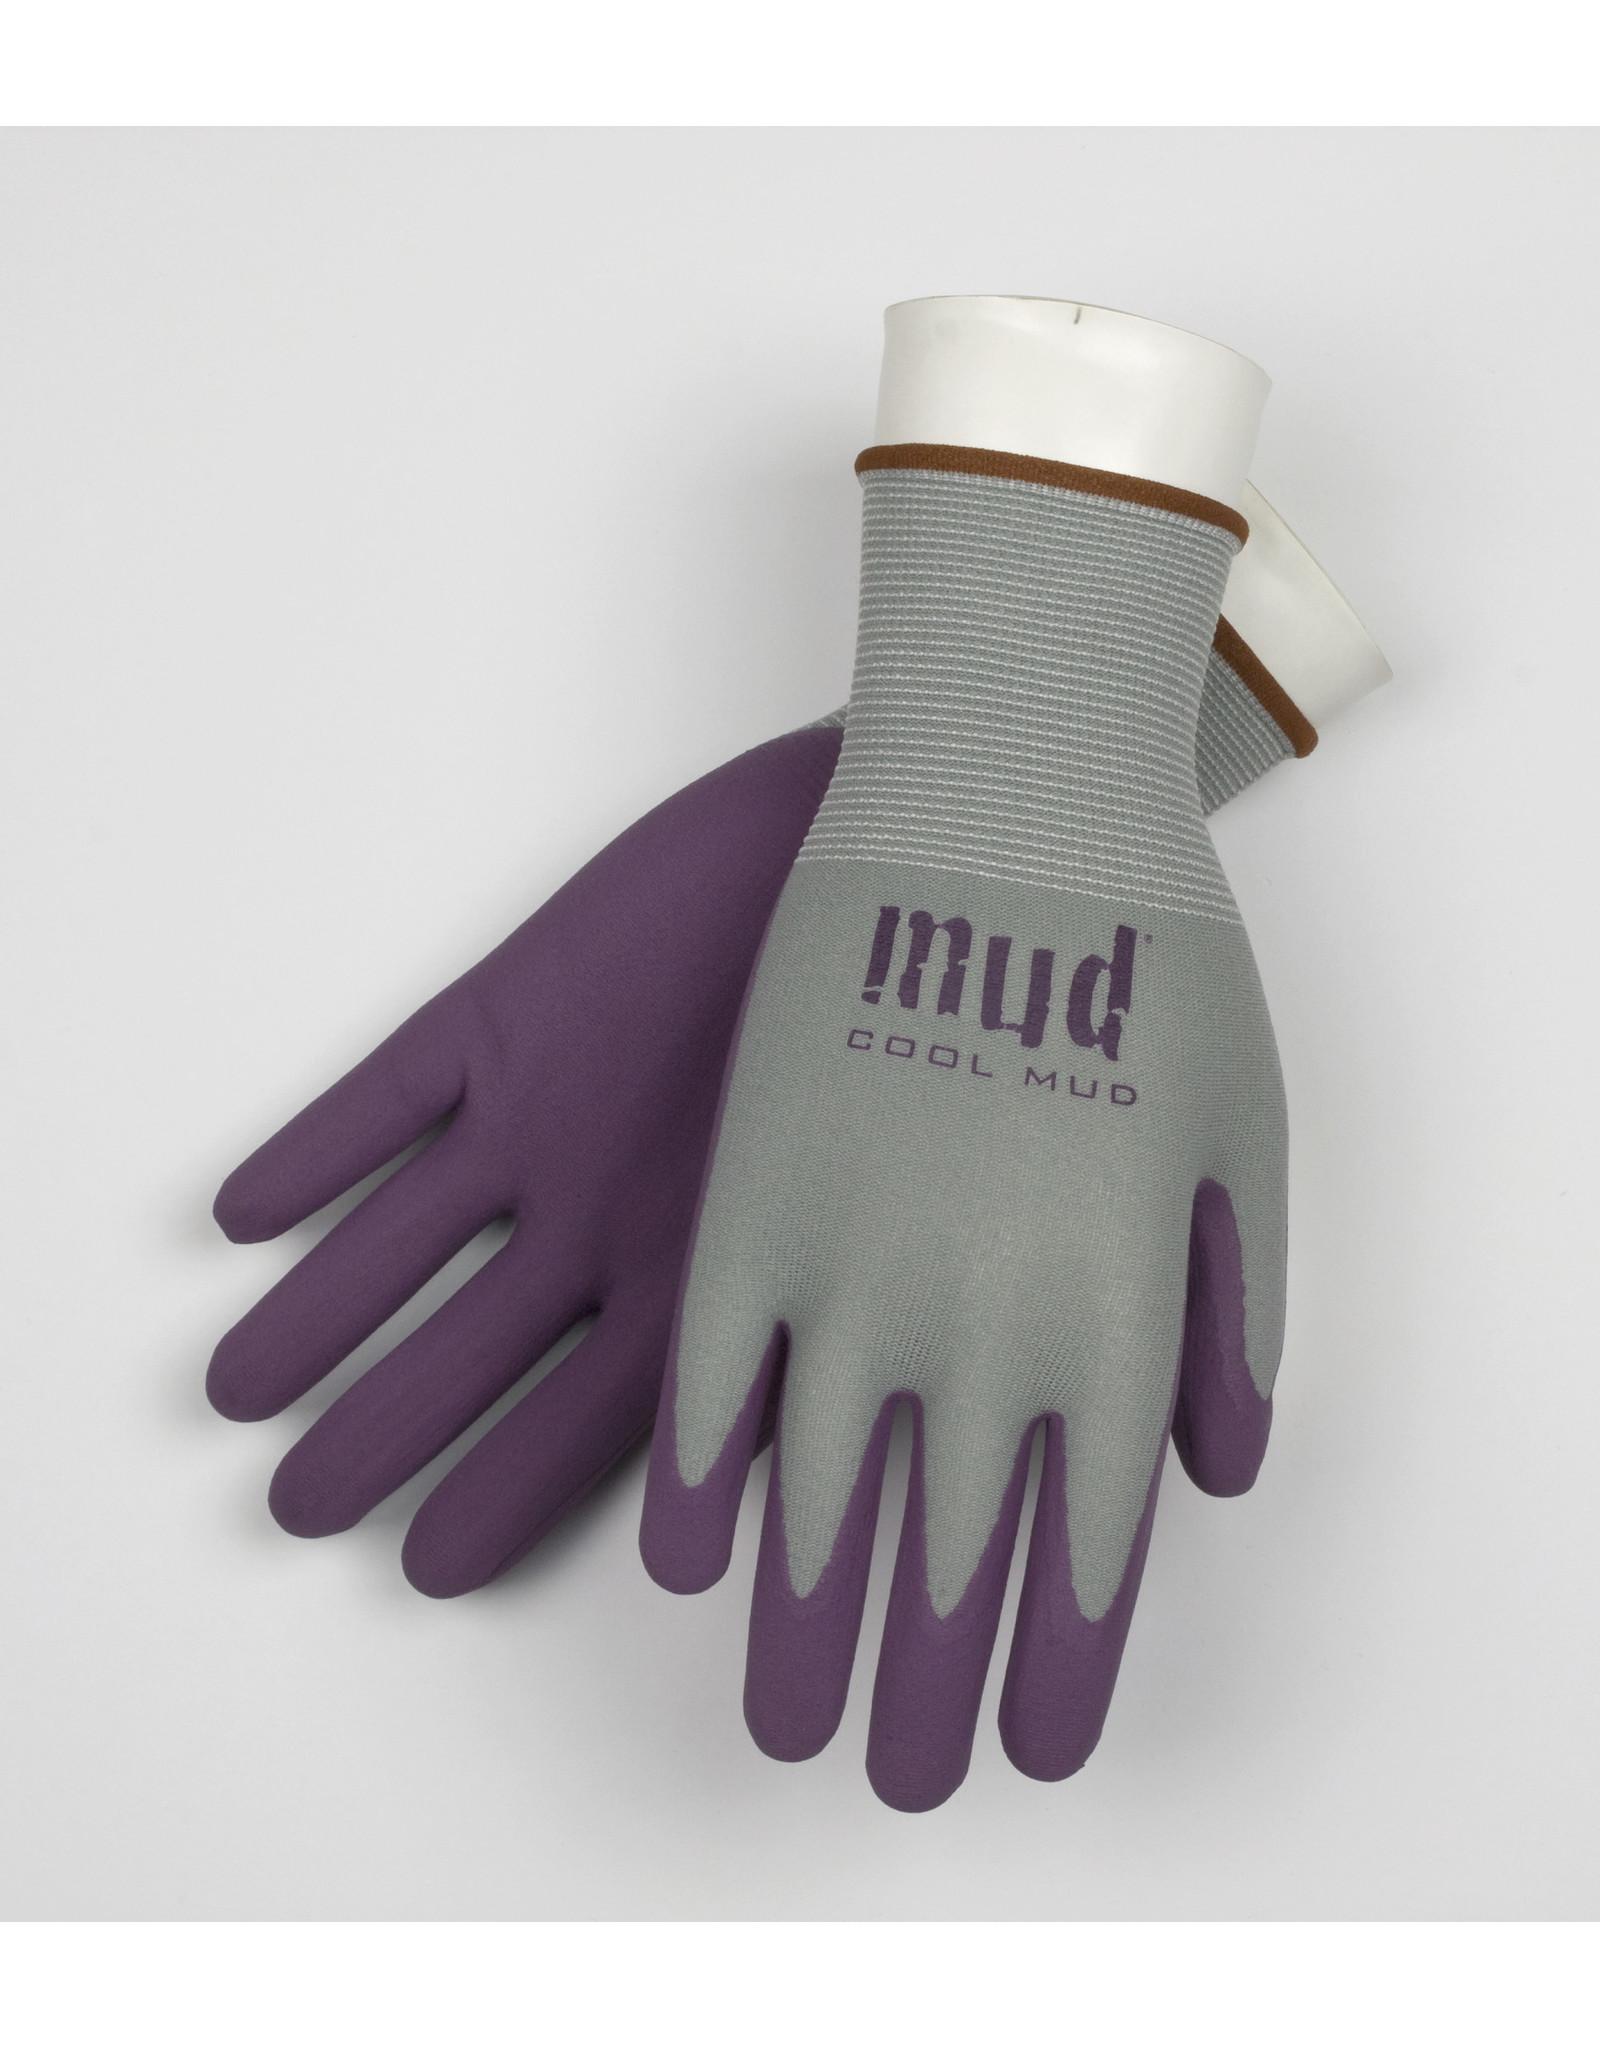 Cool Mud Gloves